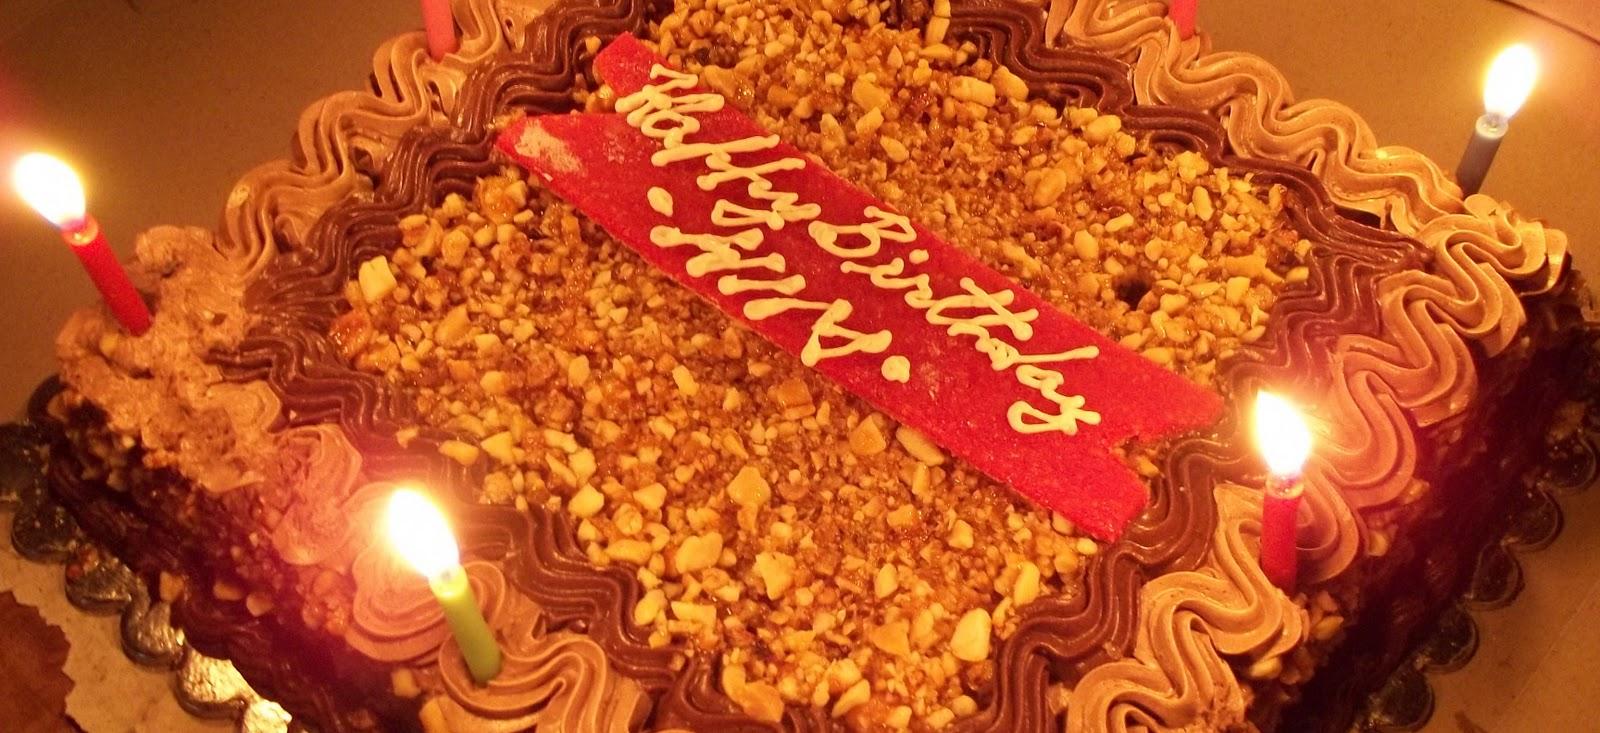 Birthday Cake Images With Name Himanshu : Emoverse!!: Cake: My Friend s Birthday... Yummy!